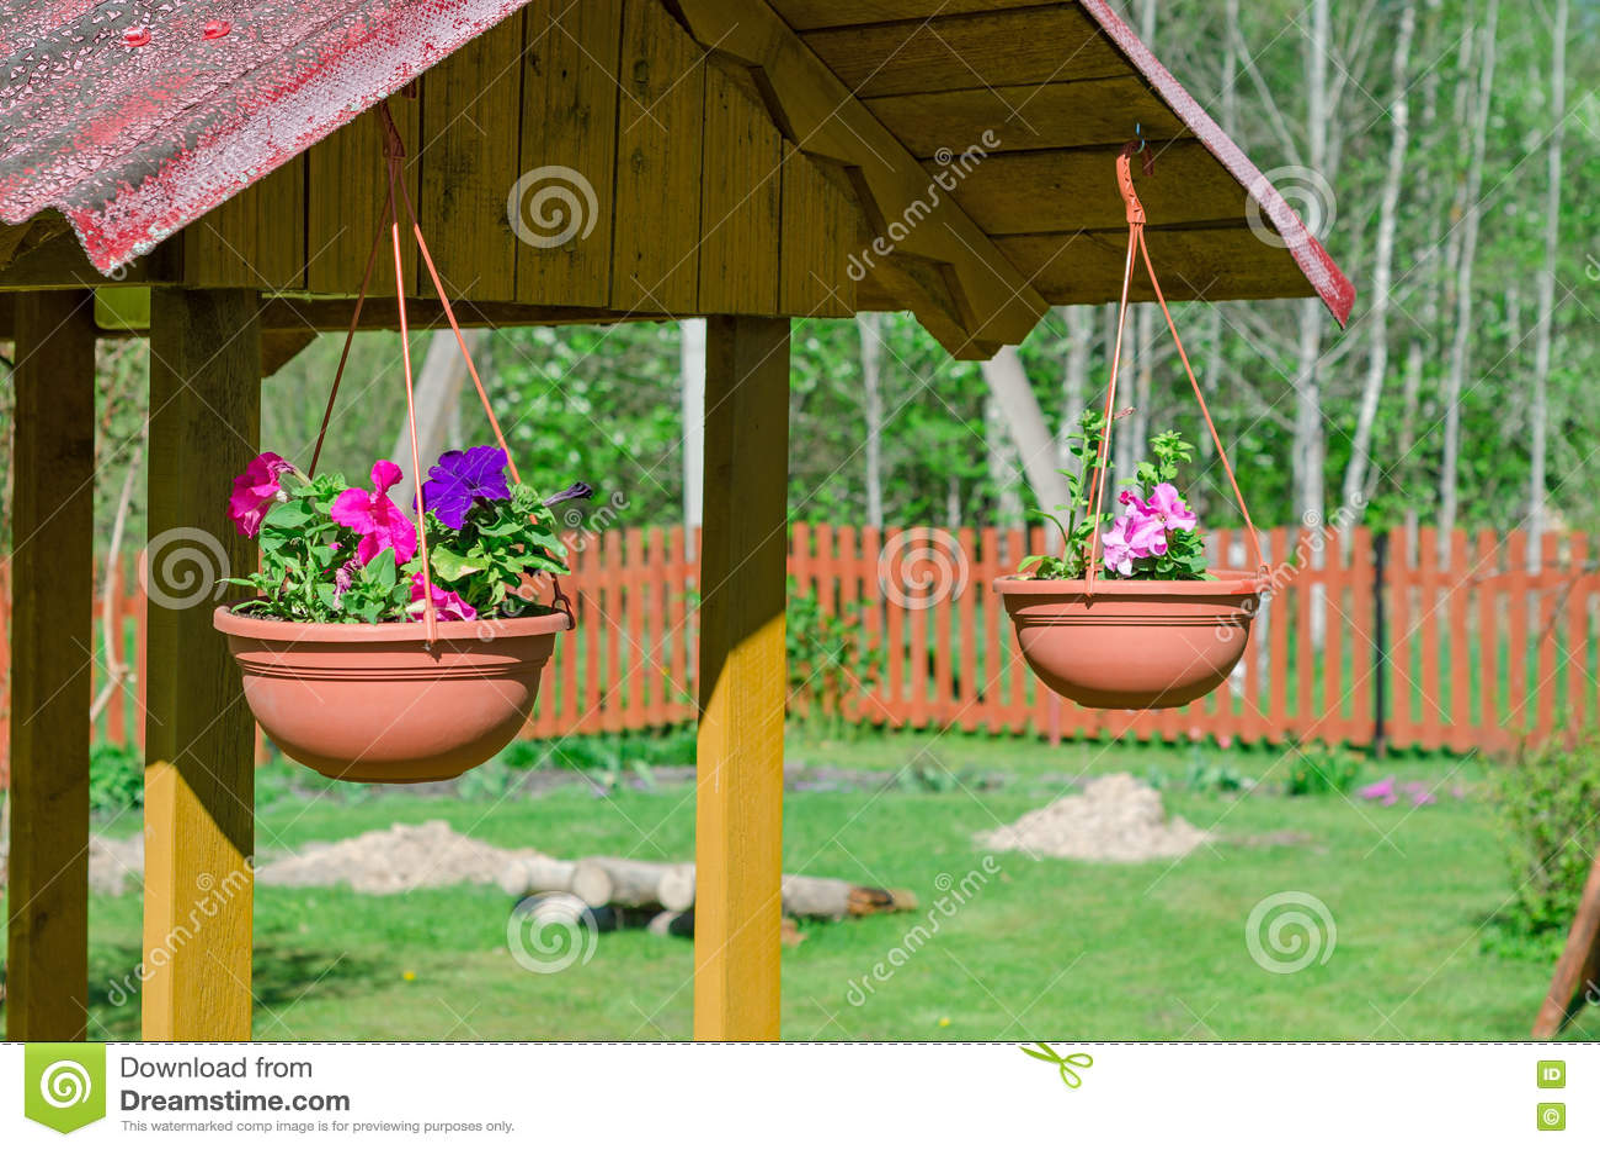 Well dekoracj petunie w garnkach